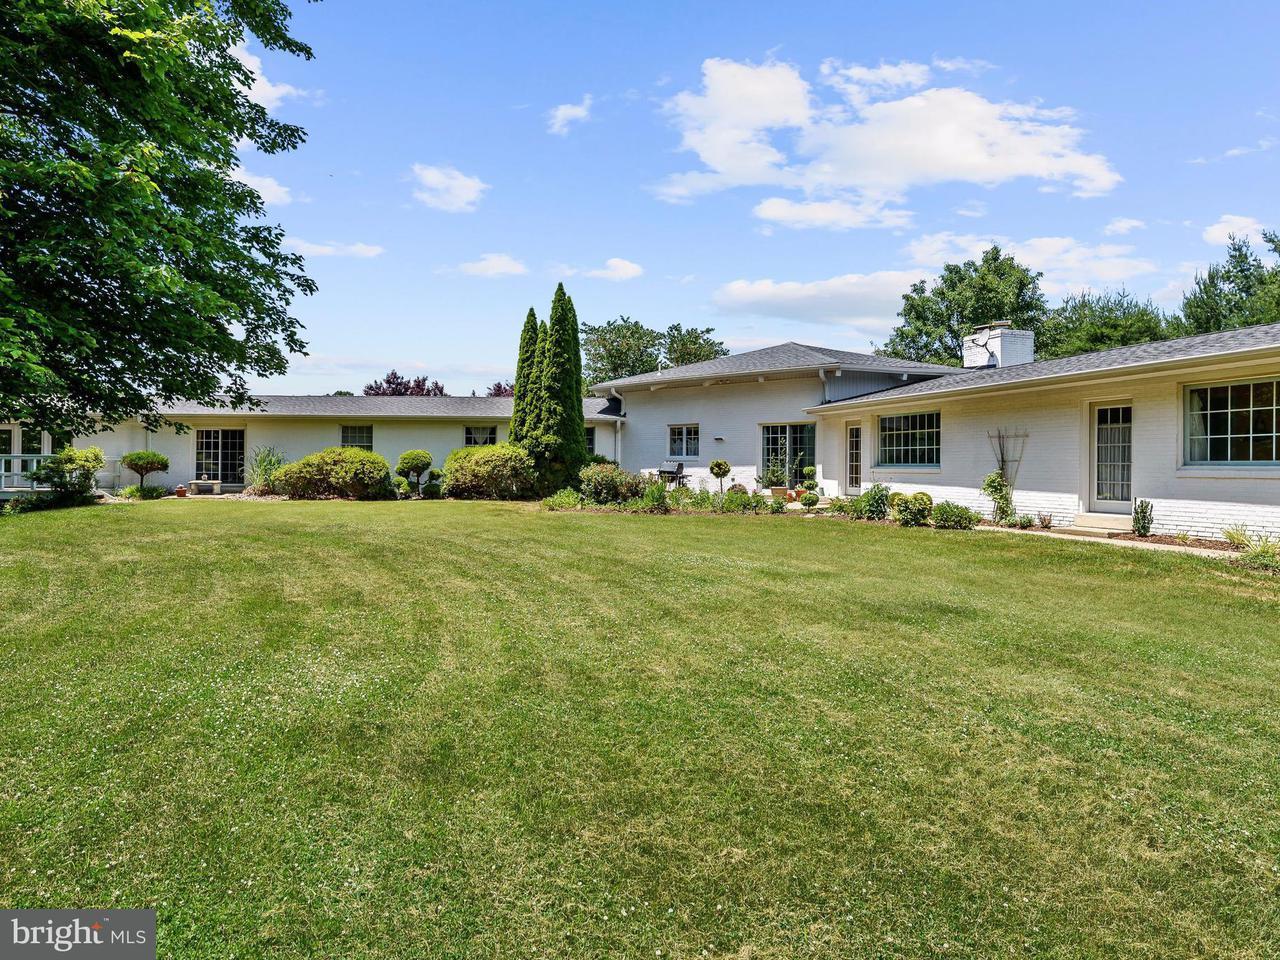 Single Family Home for Sale at 14836 CHESTNUT Court 14836 CHESTNUT Court Glenelg, Maryland 21737 United States